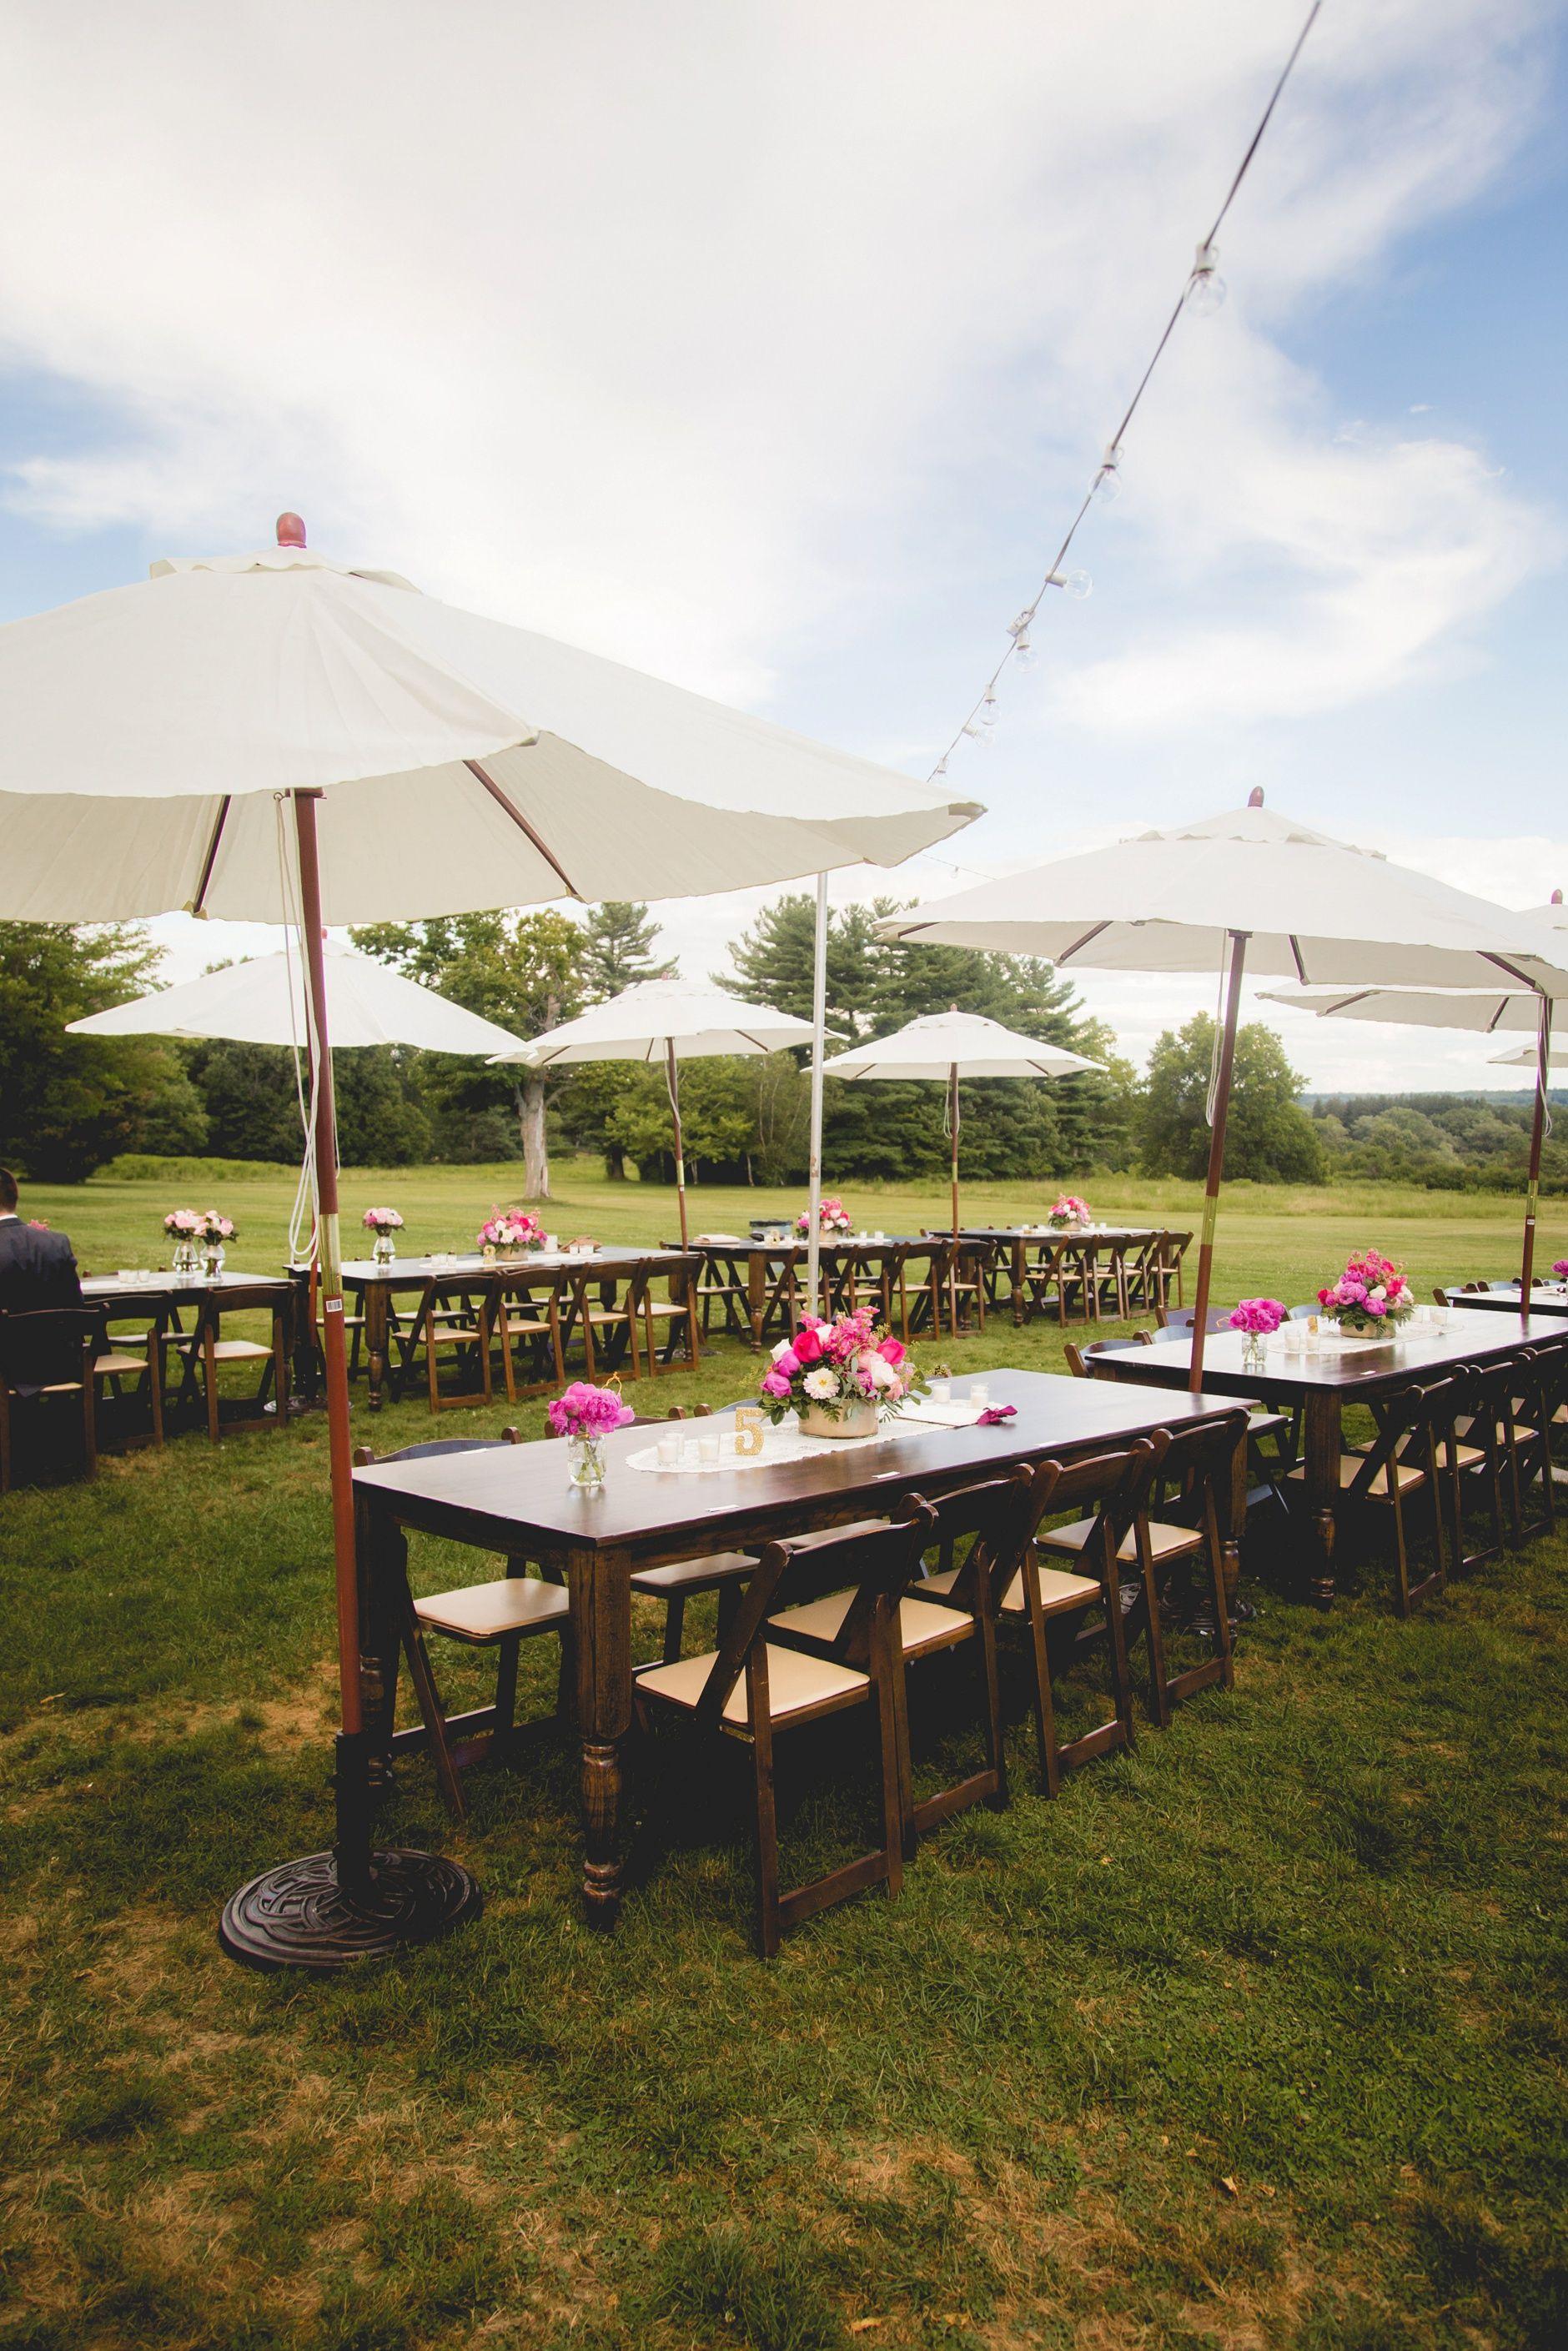 Katie Sean S Wedding At Knox Farm East Aurora Ny Photography Becca Sutherland Outdoor Decor Patio Umbrella Patio